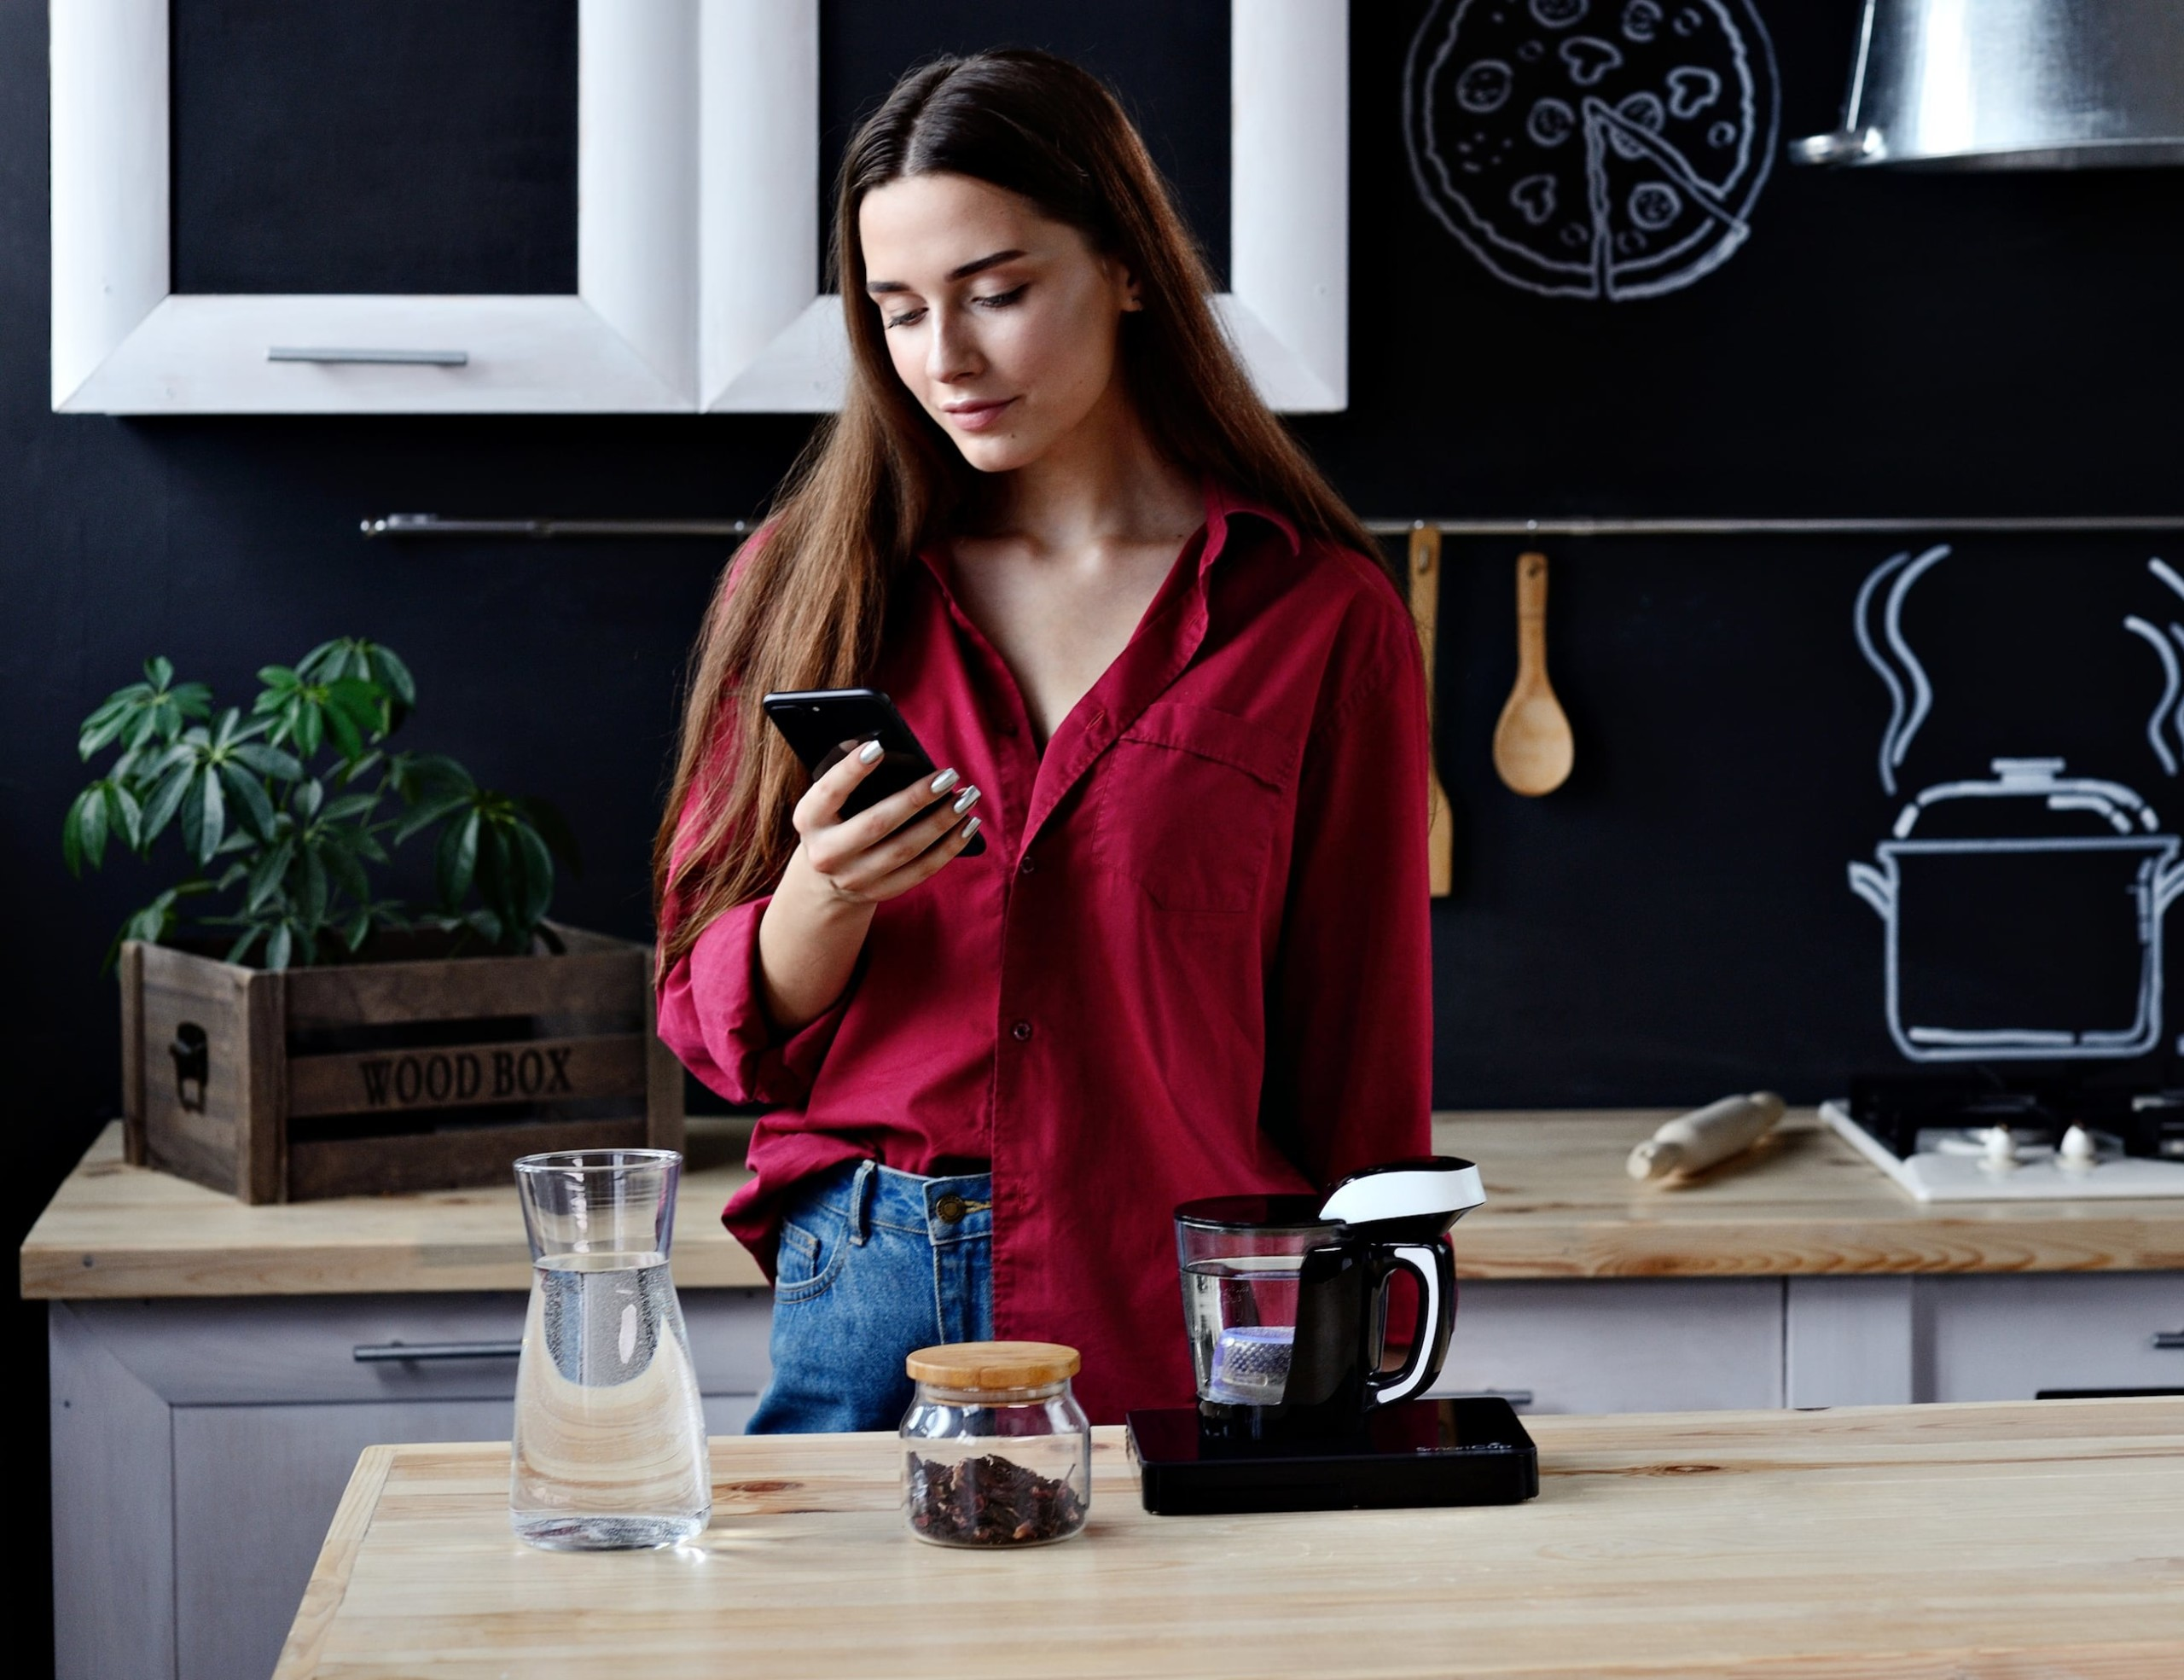 SmartCup Automated Beverage Preparing Device